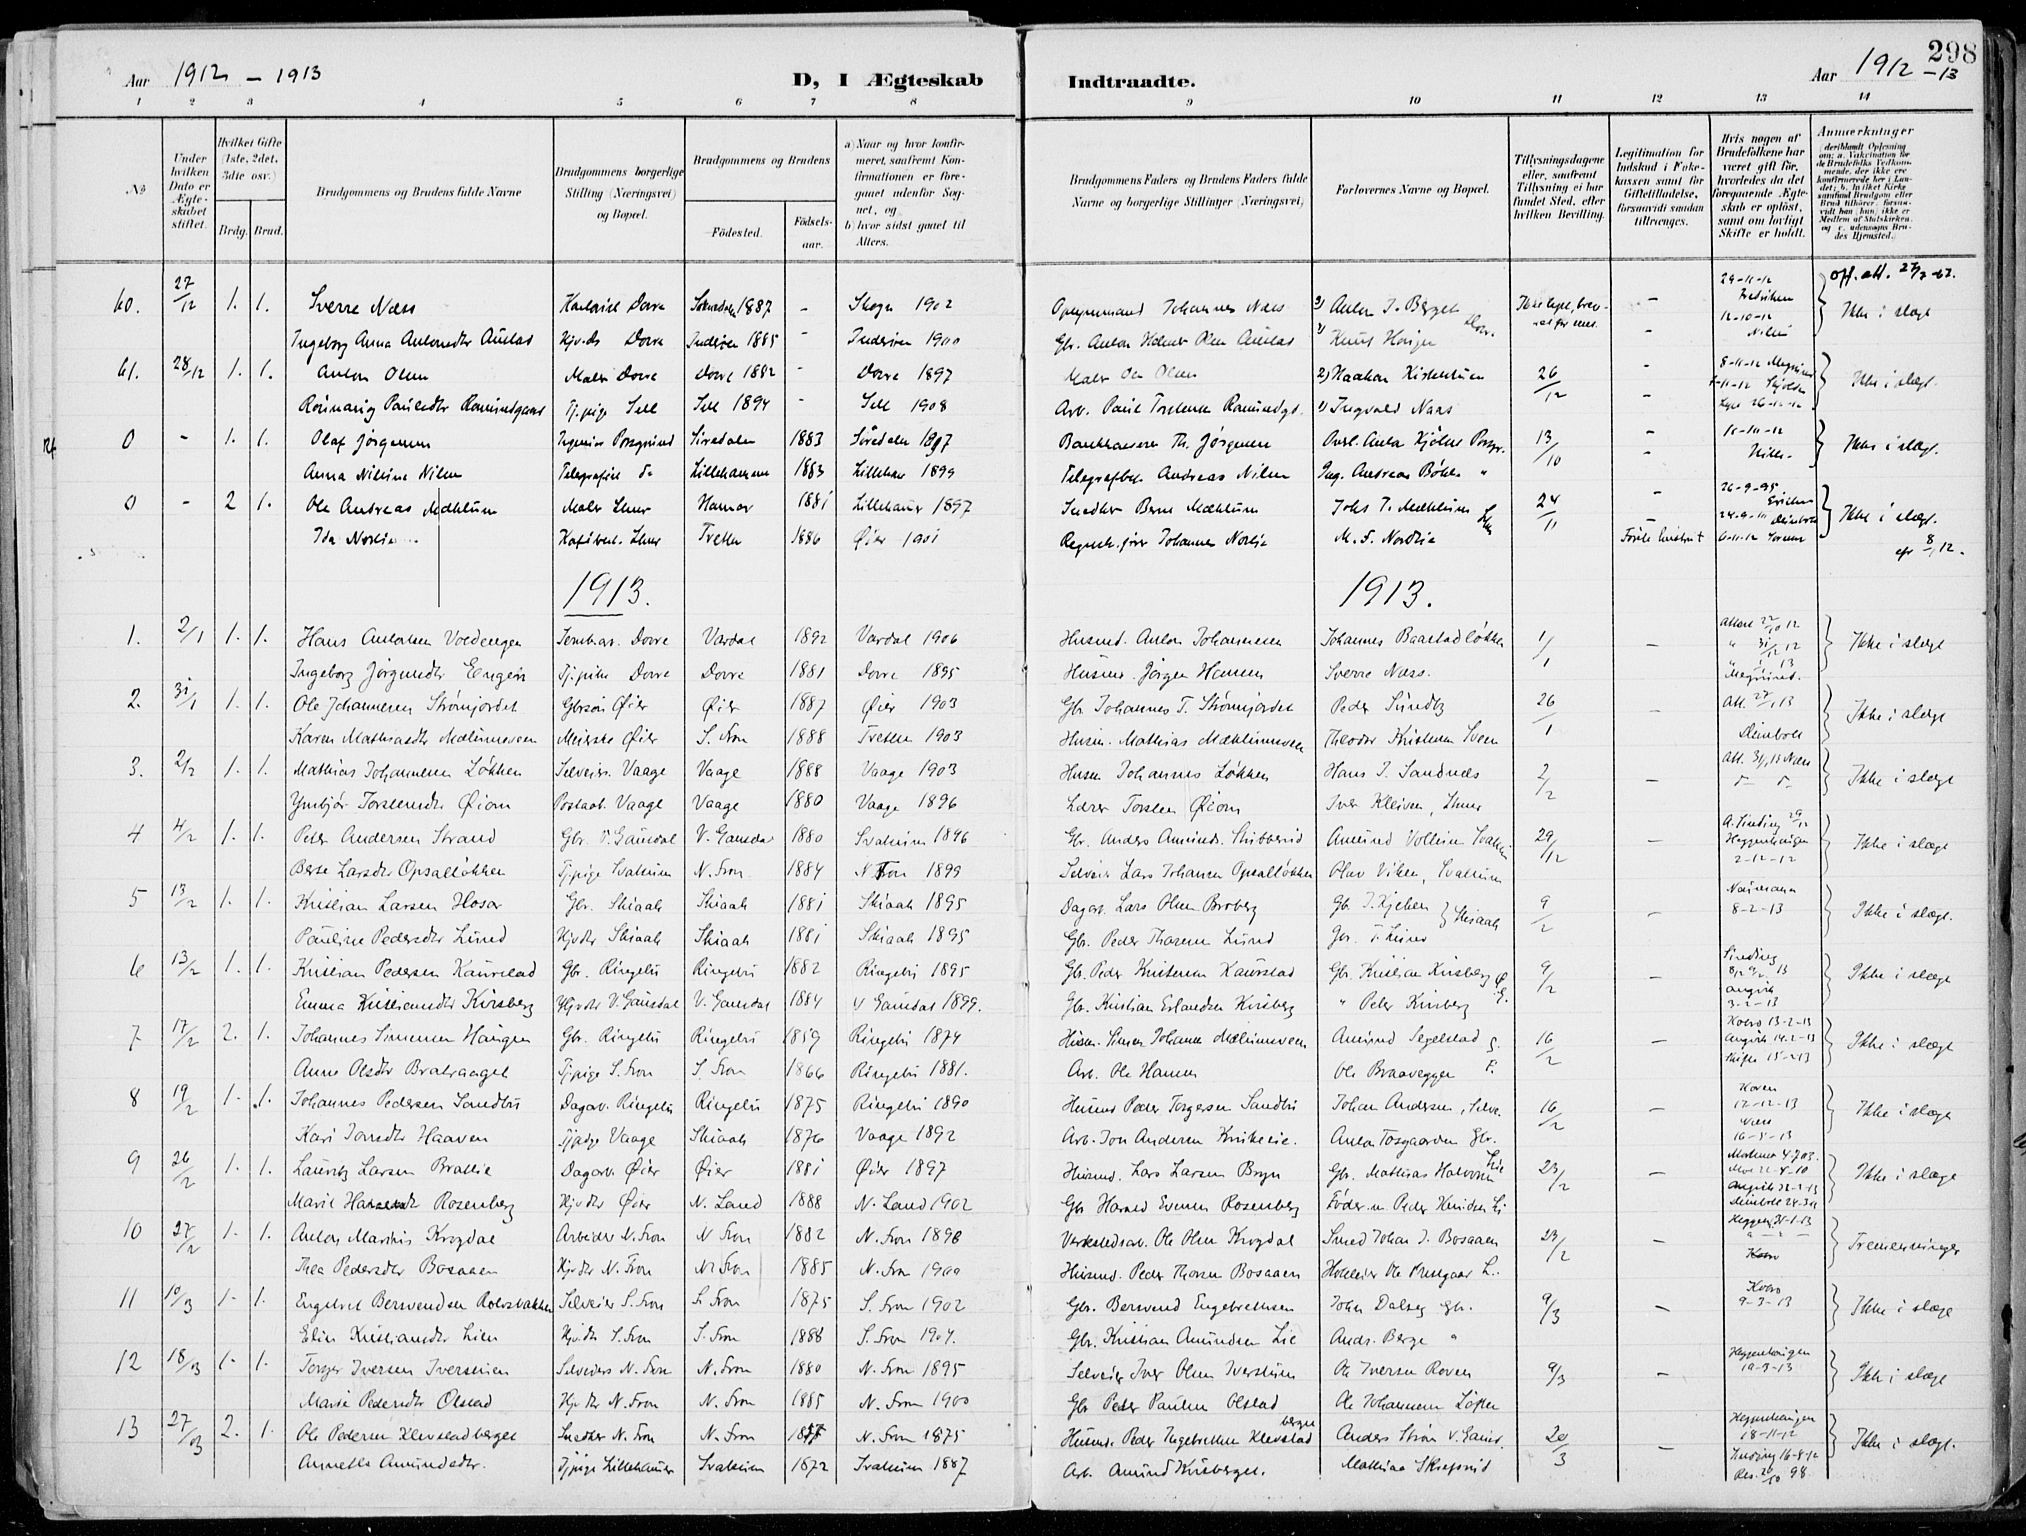 SAH, Lillehammer prestekontor, Ministerialbok nr. 1, 1901-1916, s. 298